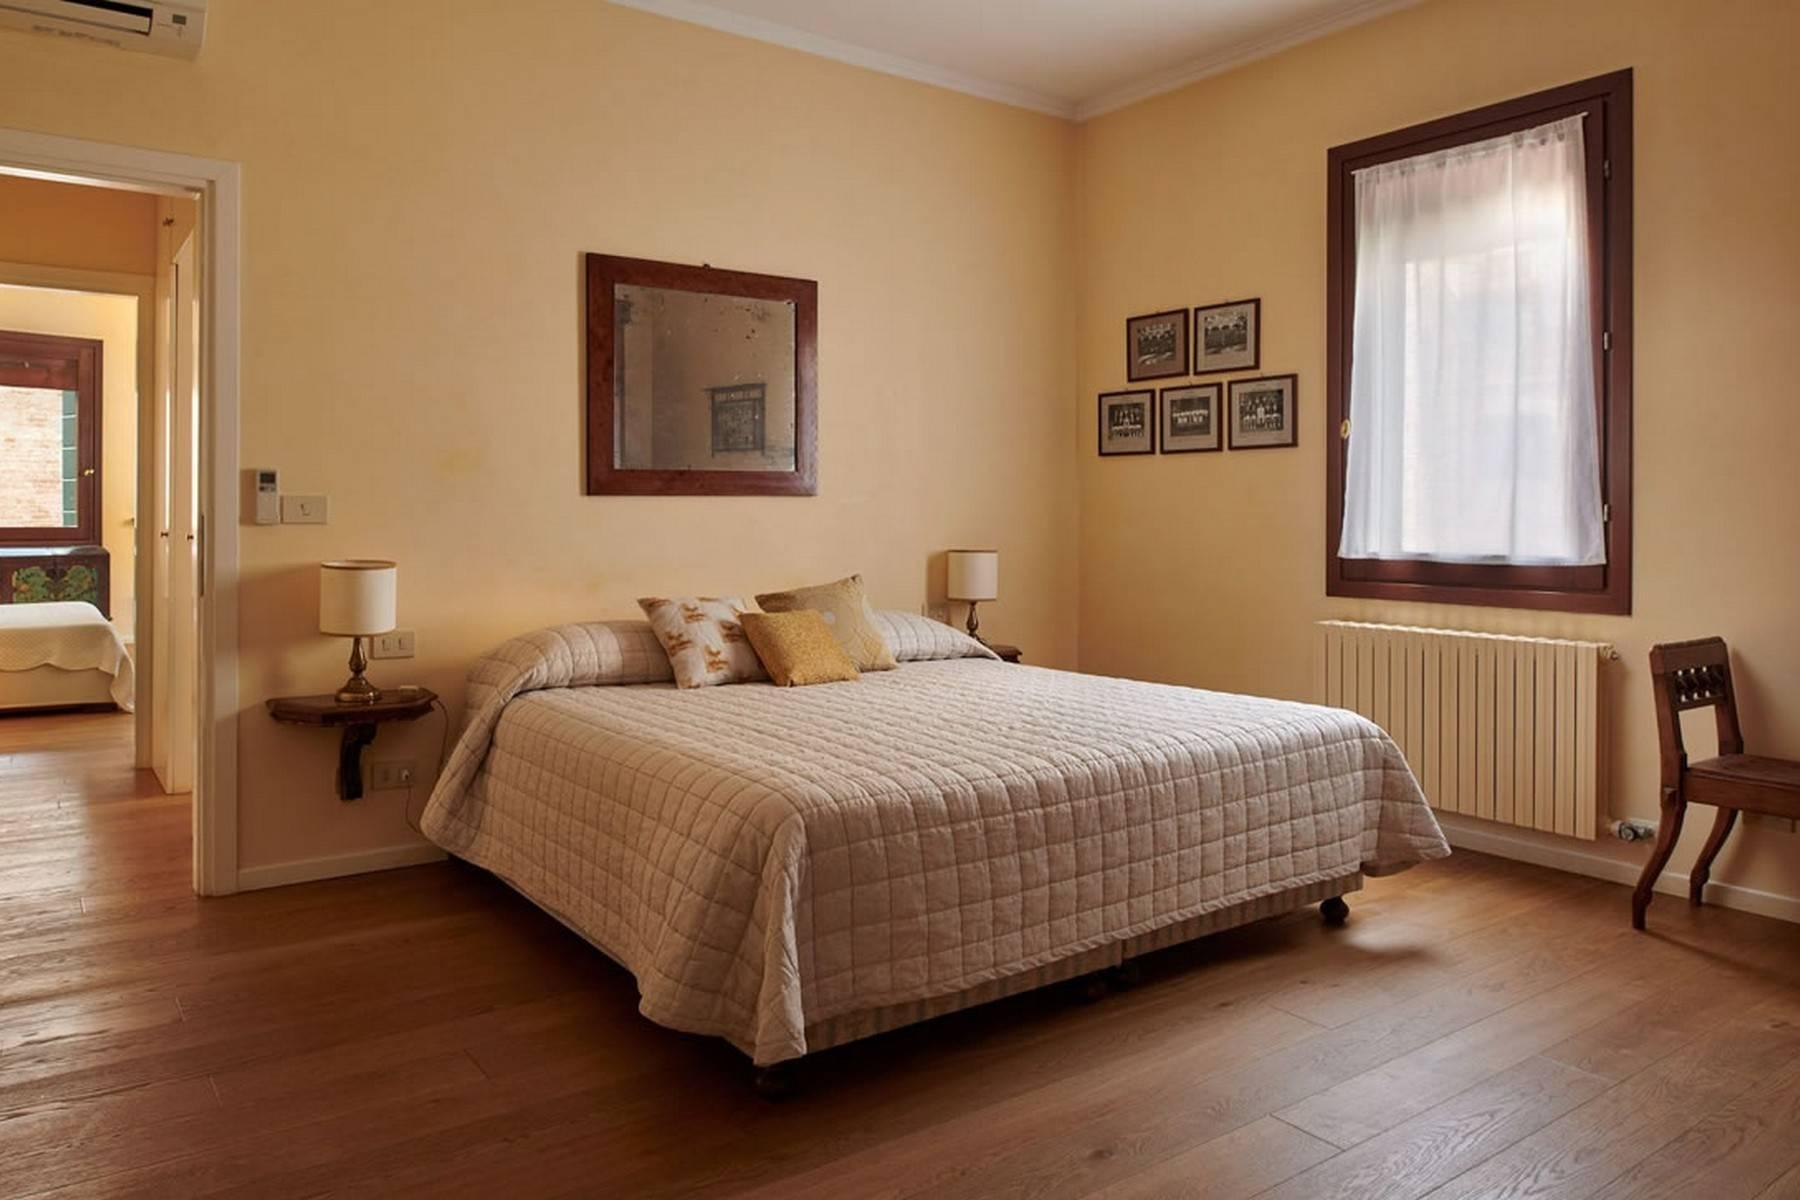 Appartement de design dans le Palazzo Querini Stampalia / S.M. Formosa - 18